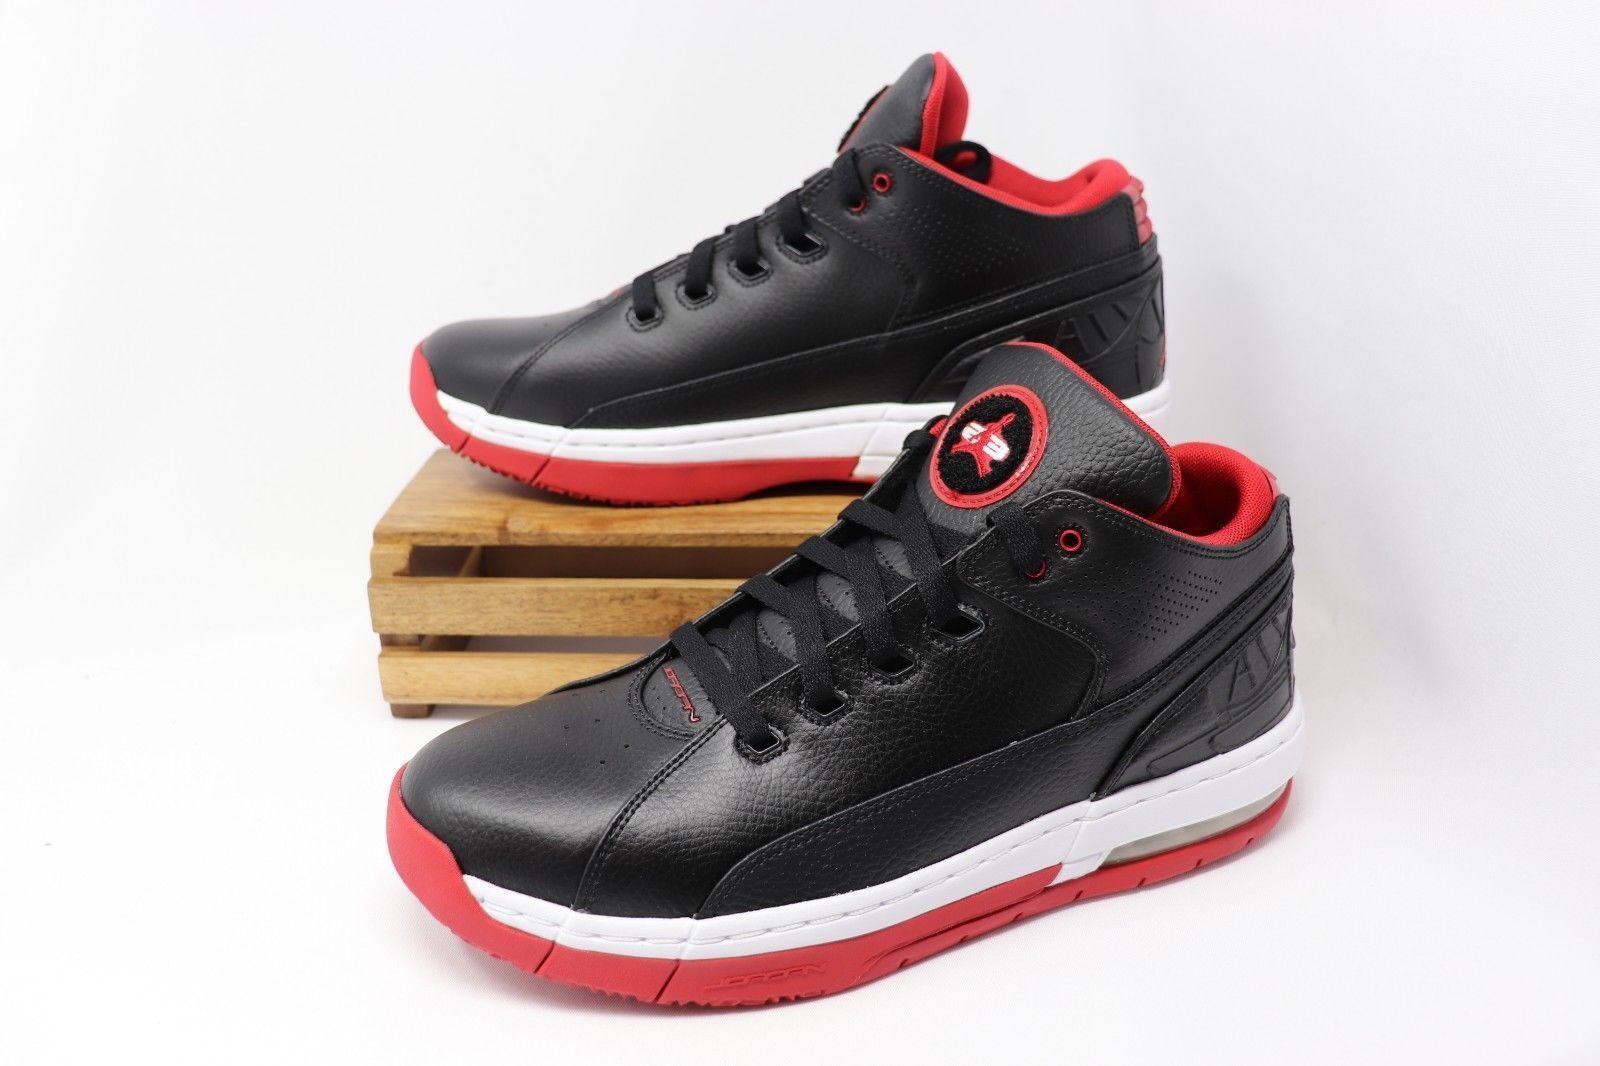 89a9c4b87d7 Nike Jordan Ol school Low Mens 317765-006 Black Red Basketball Shoes ...